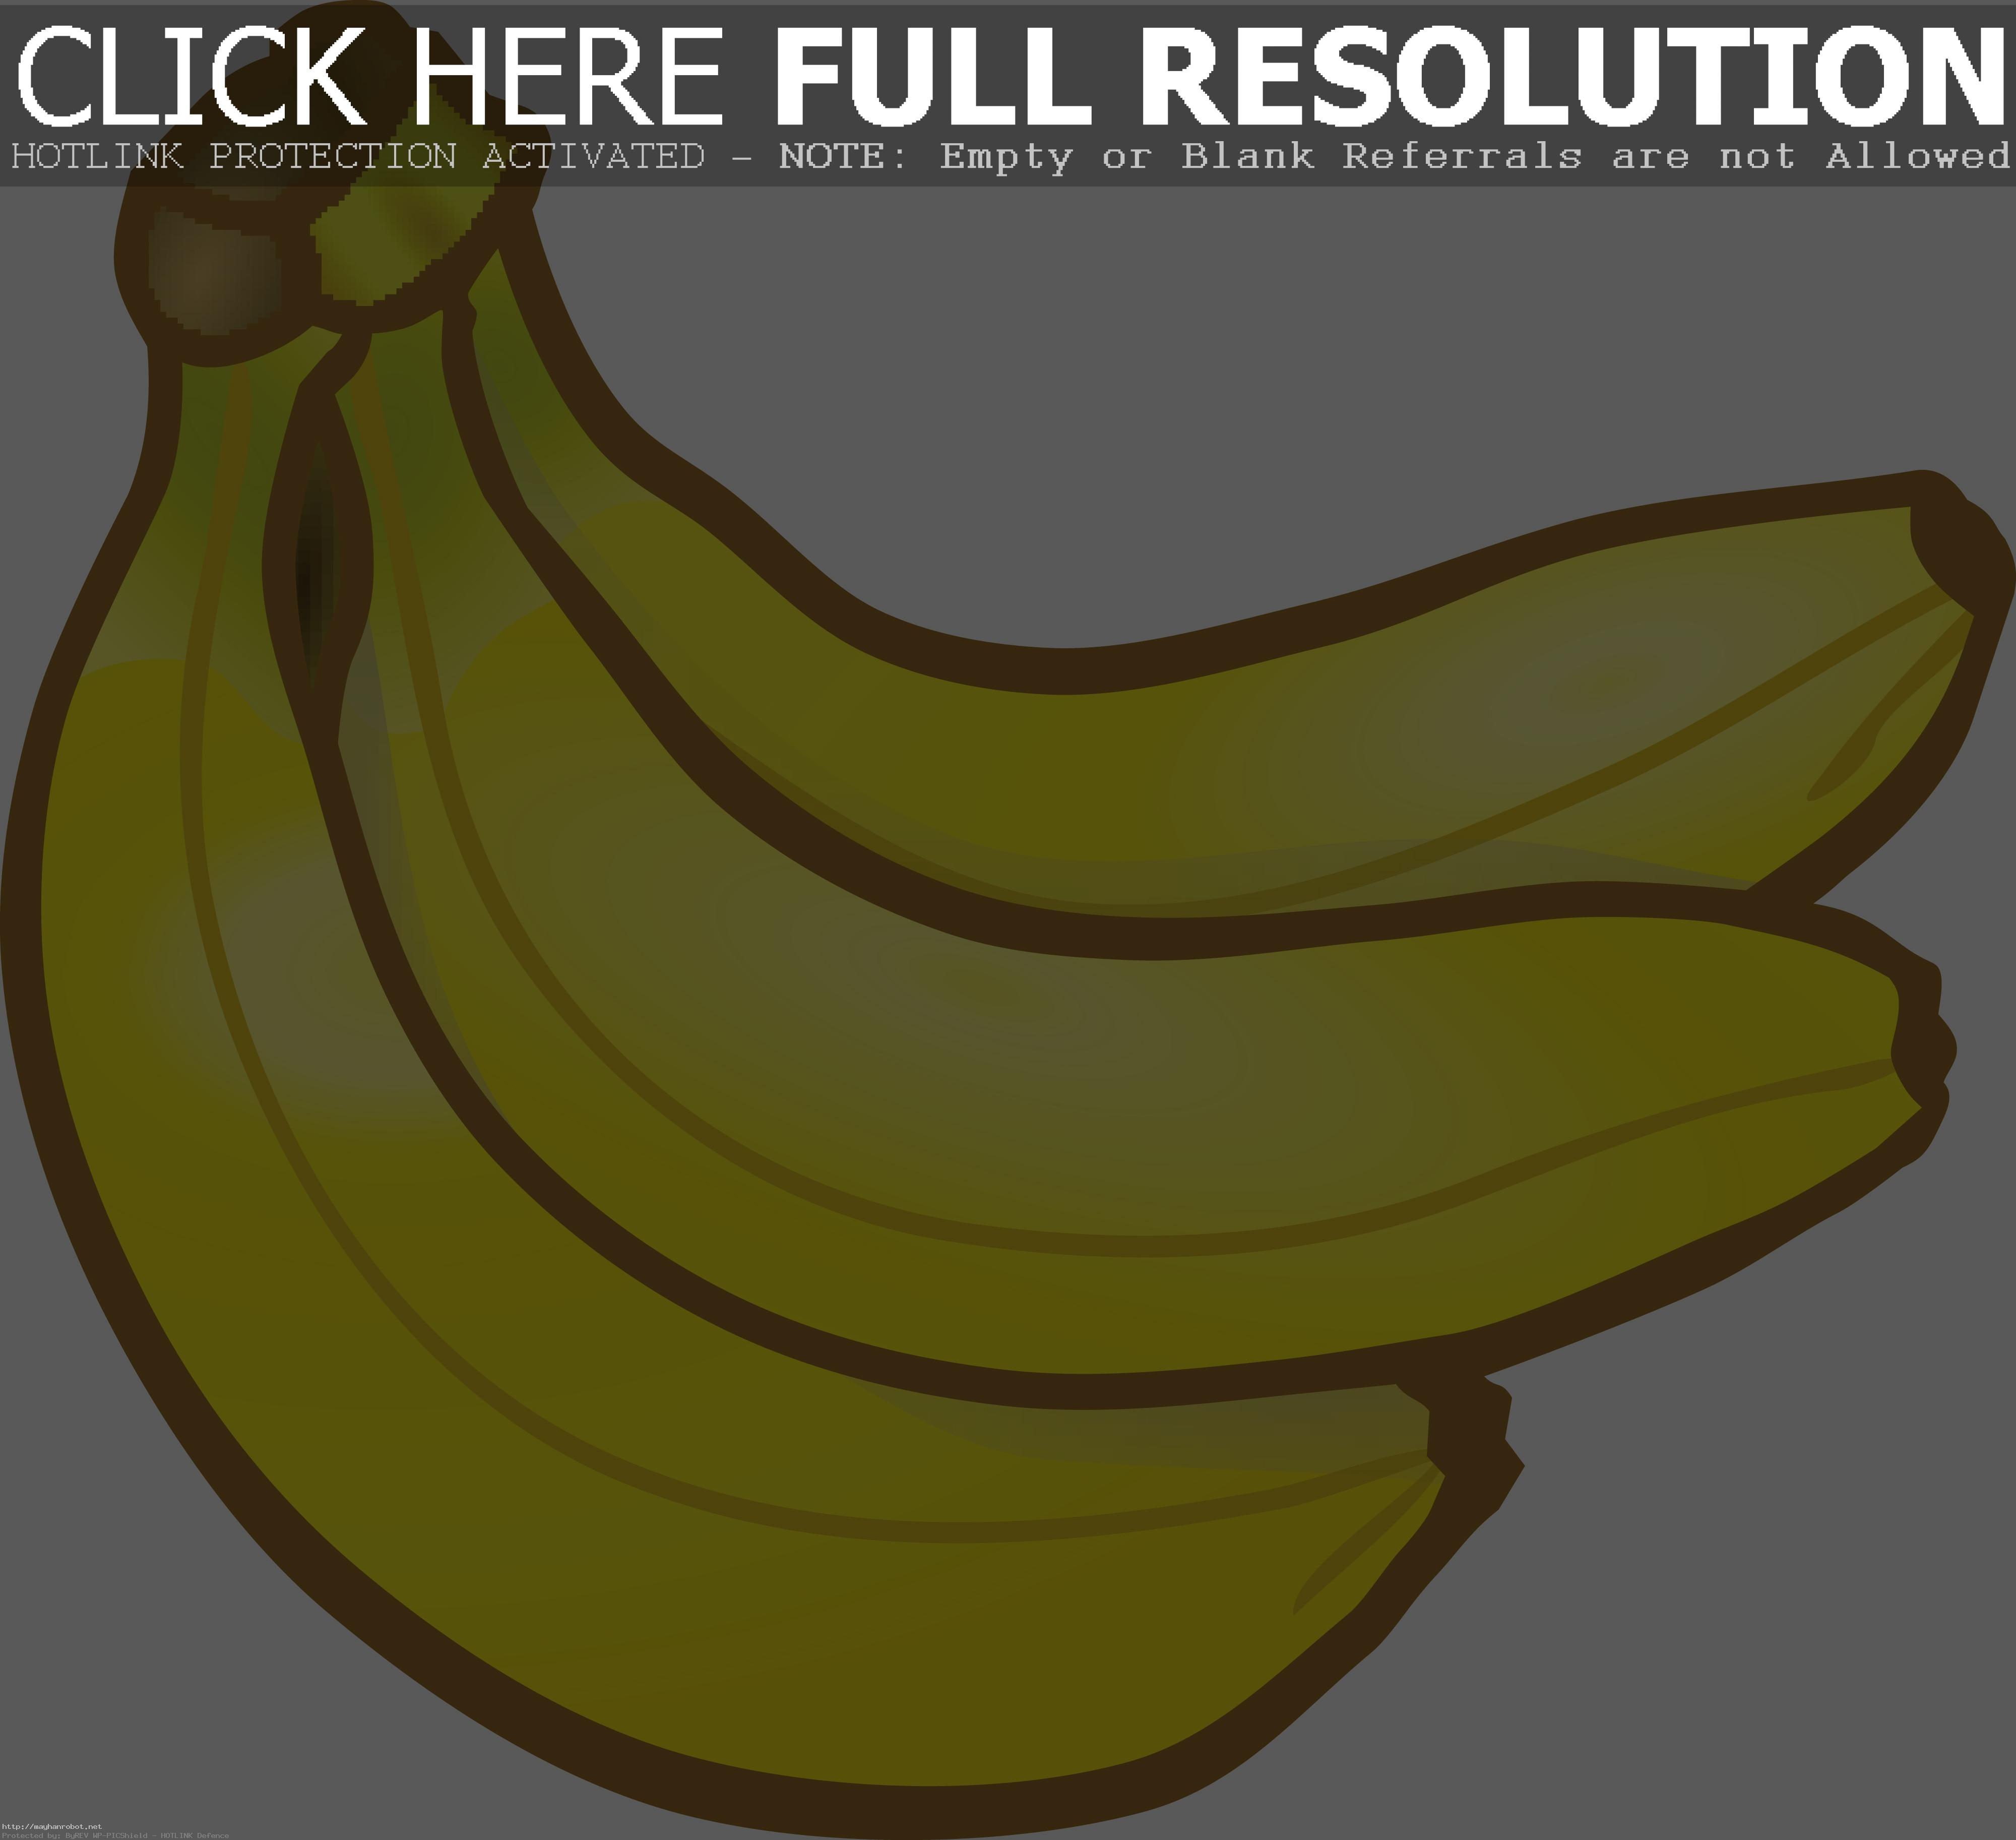 1636 Free Clipart Of A Banana Clip Art-1636 Free Clipart Of A Banana Clip Art-3